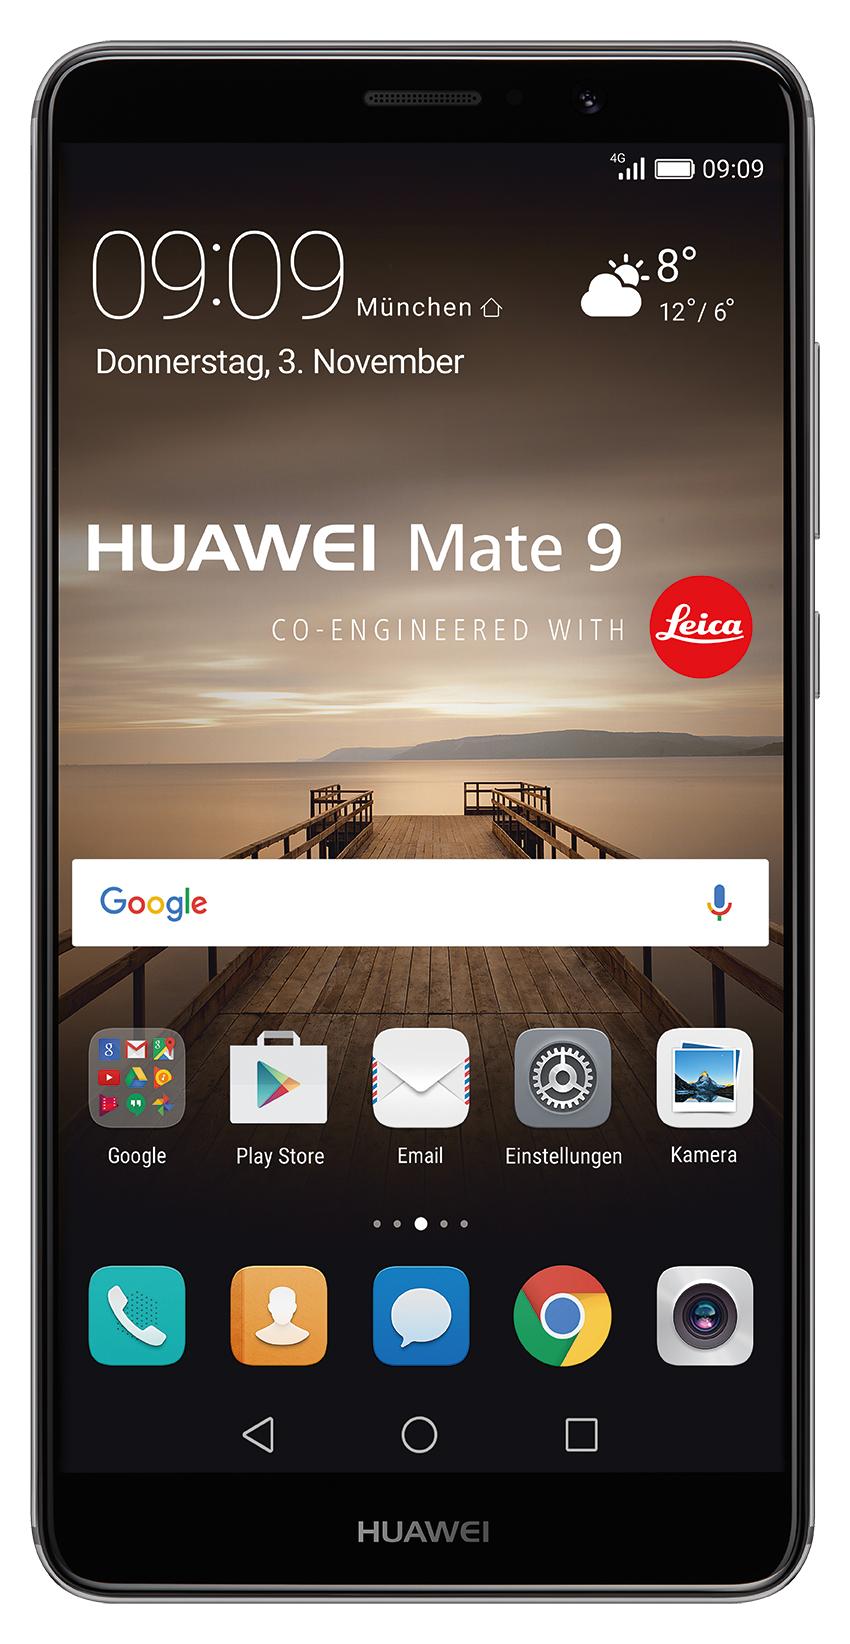 SCHWEIZ: Huawei Mate 9 Space Grey für CHF 549.- (ca. 515.- Euro)